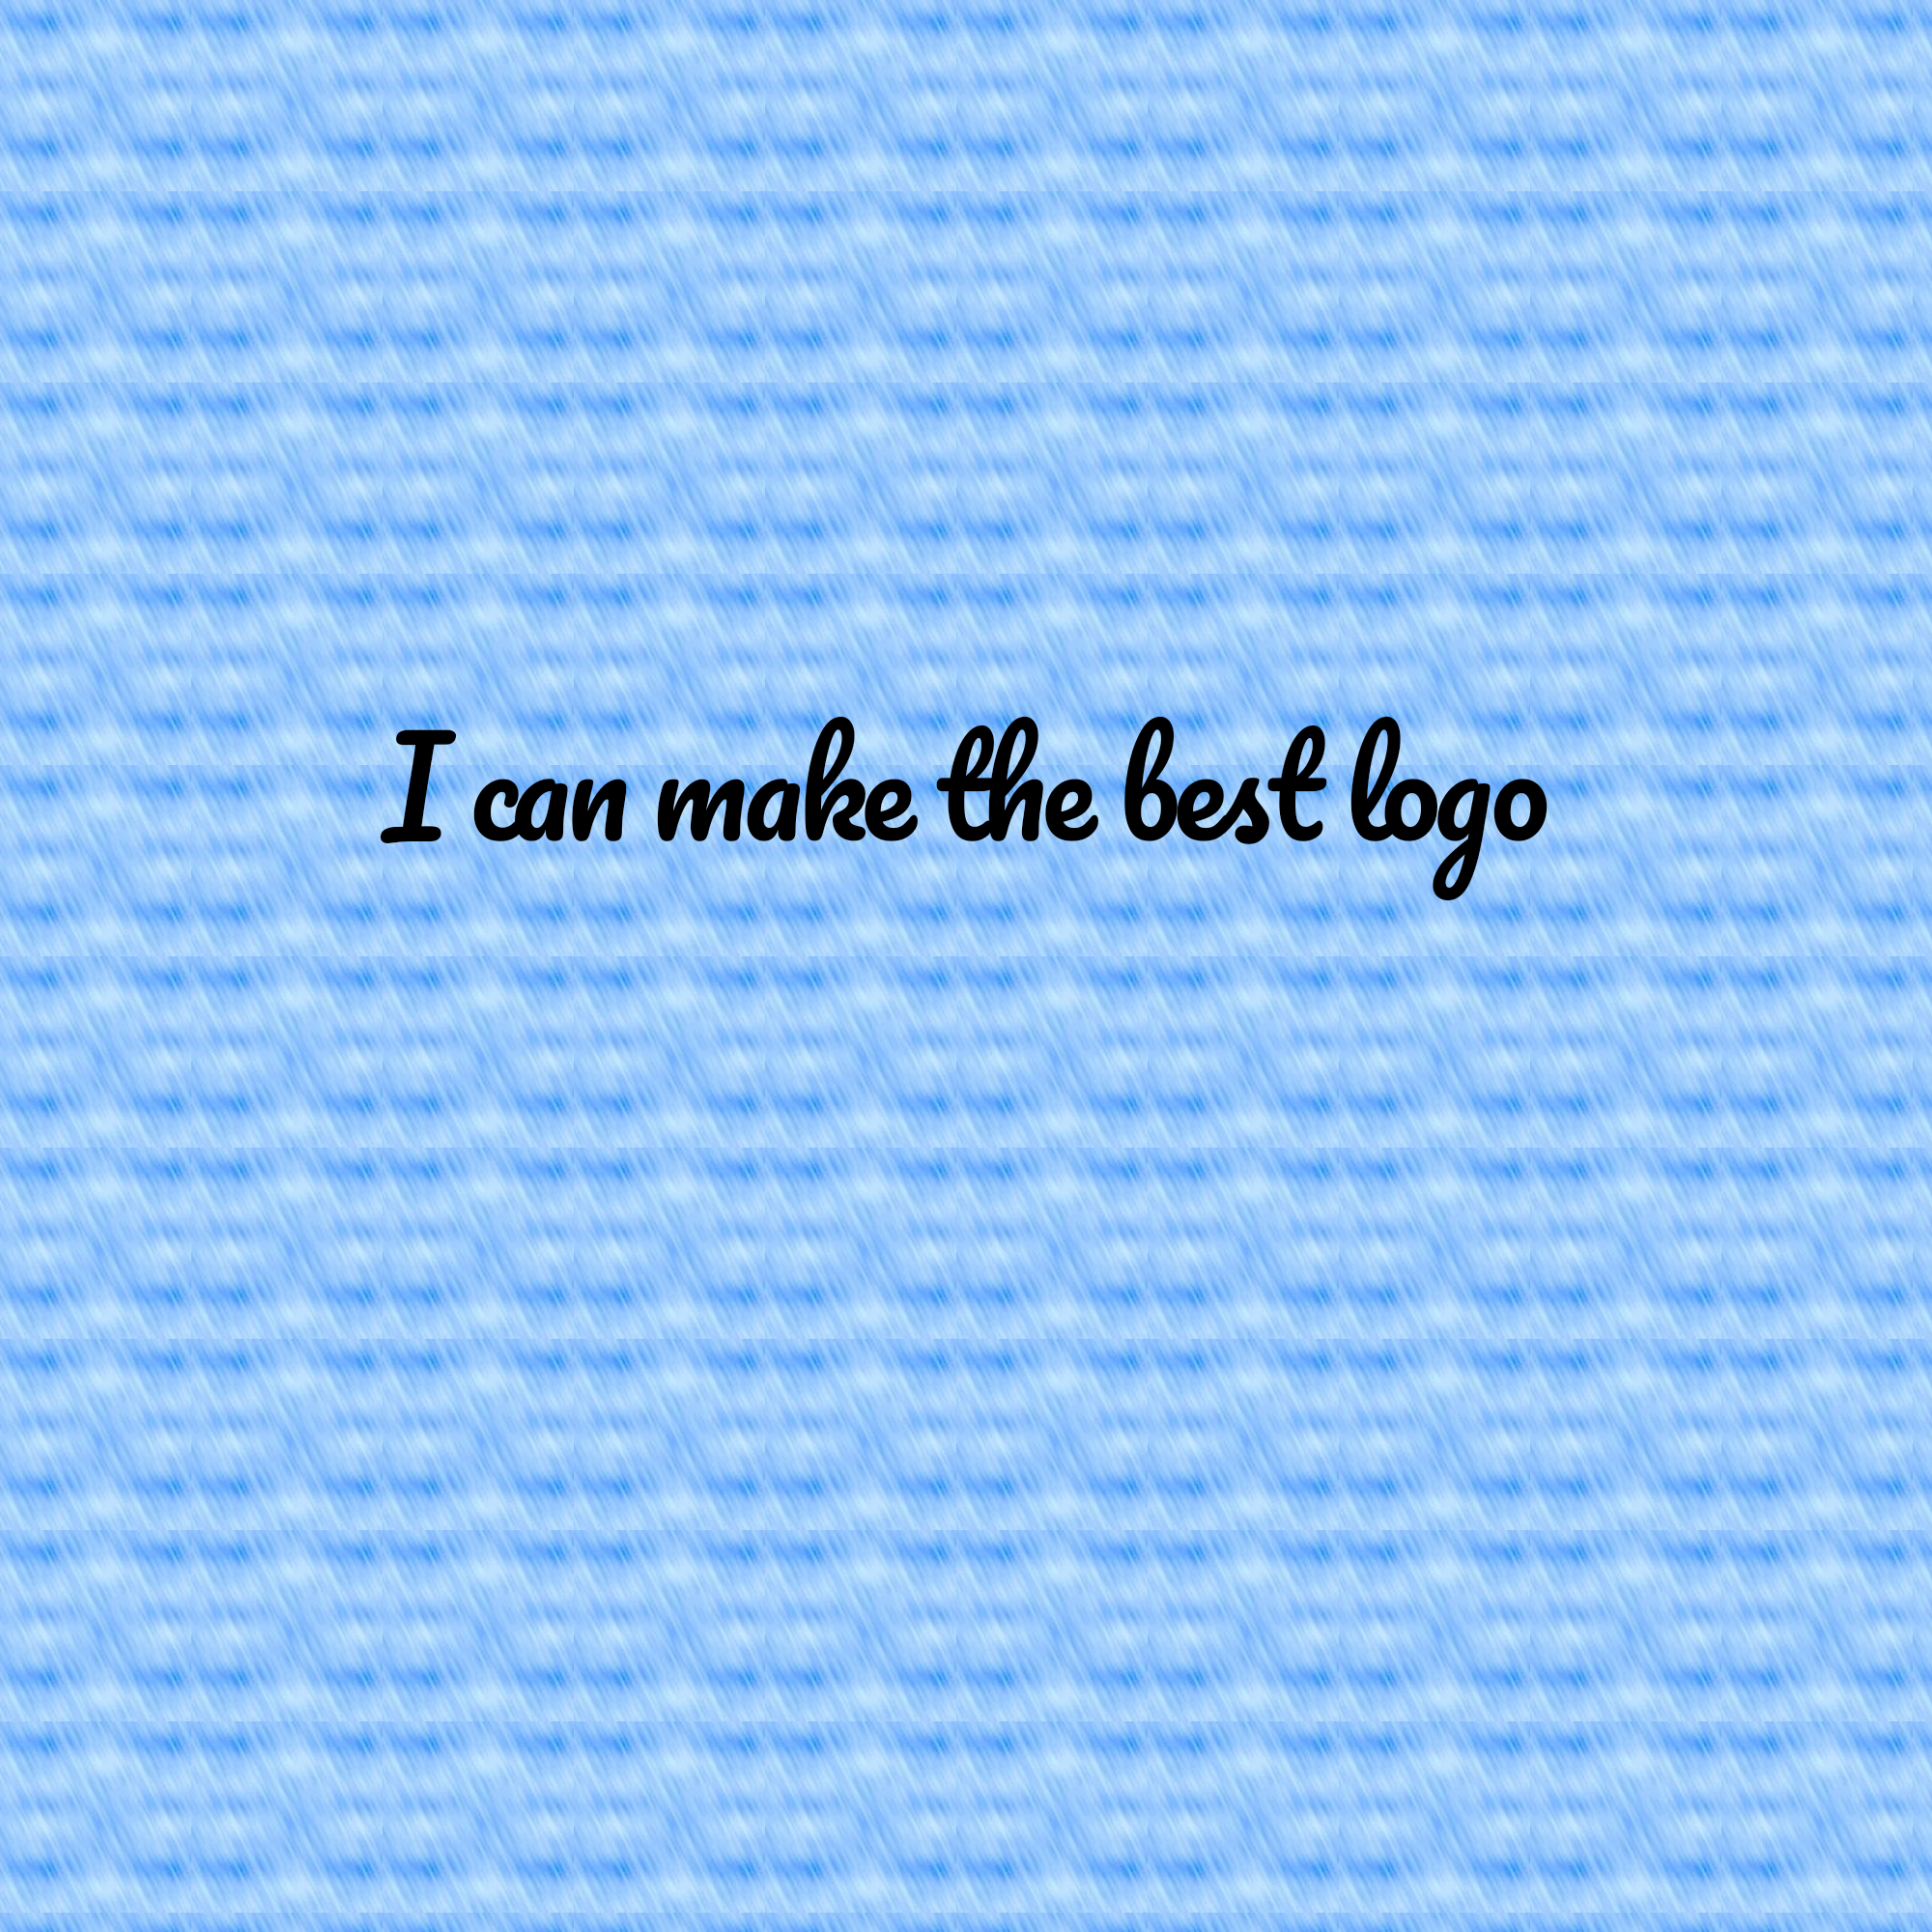 I can make the professional logo design